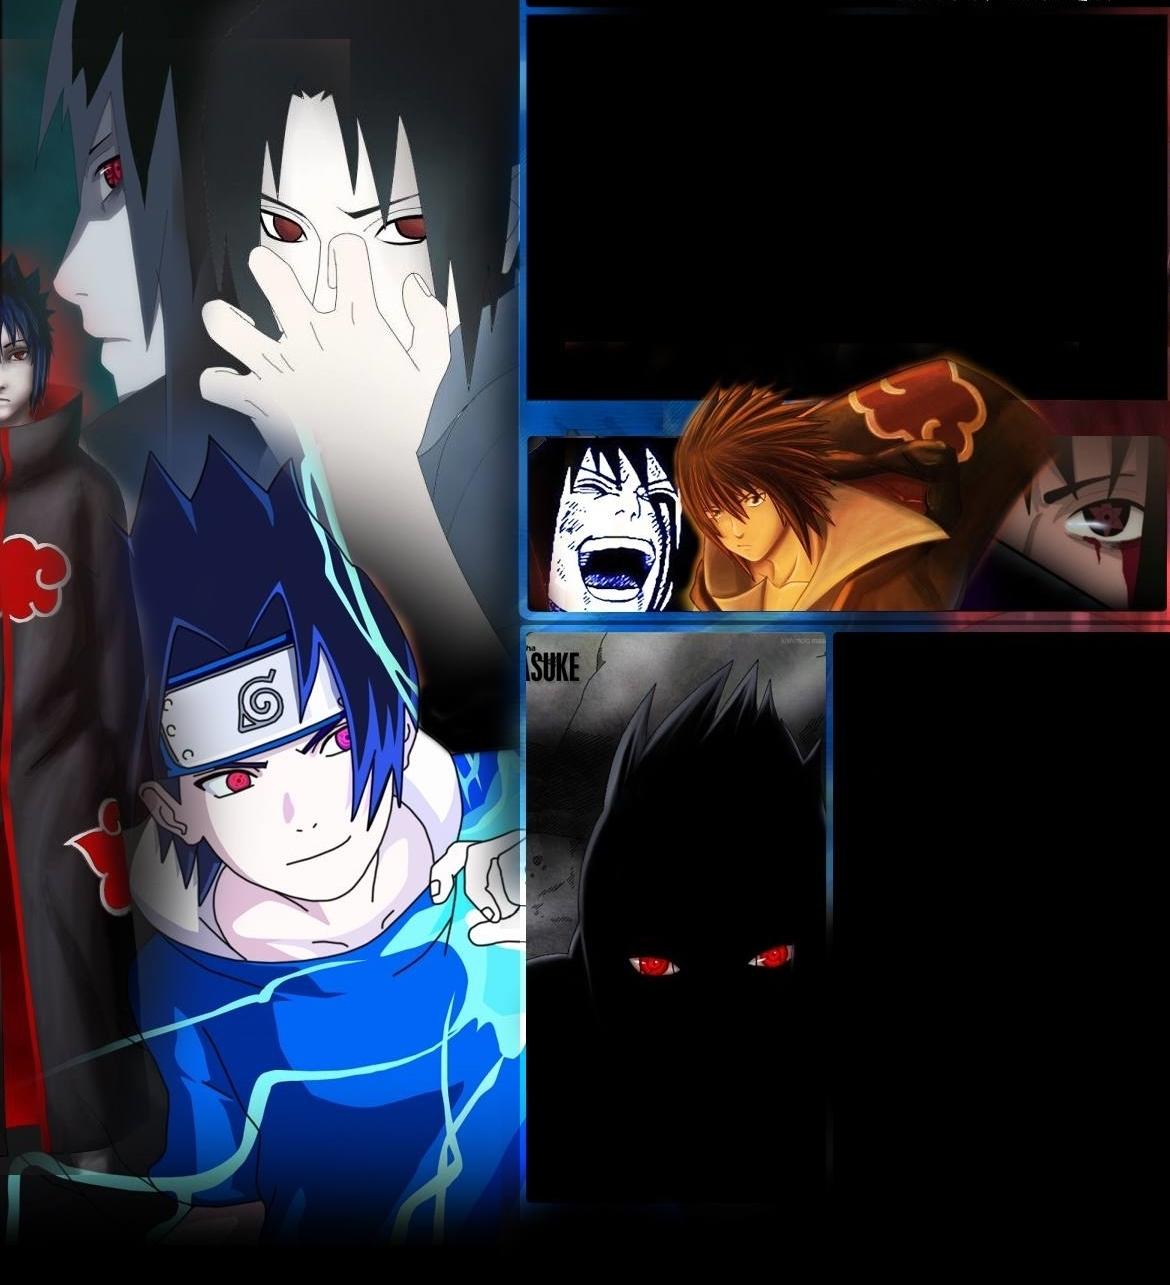 Sasuke is the best!!